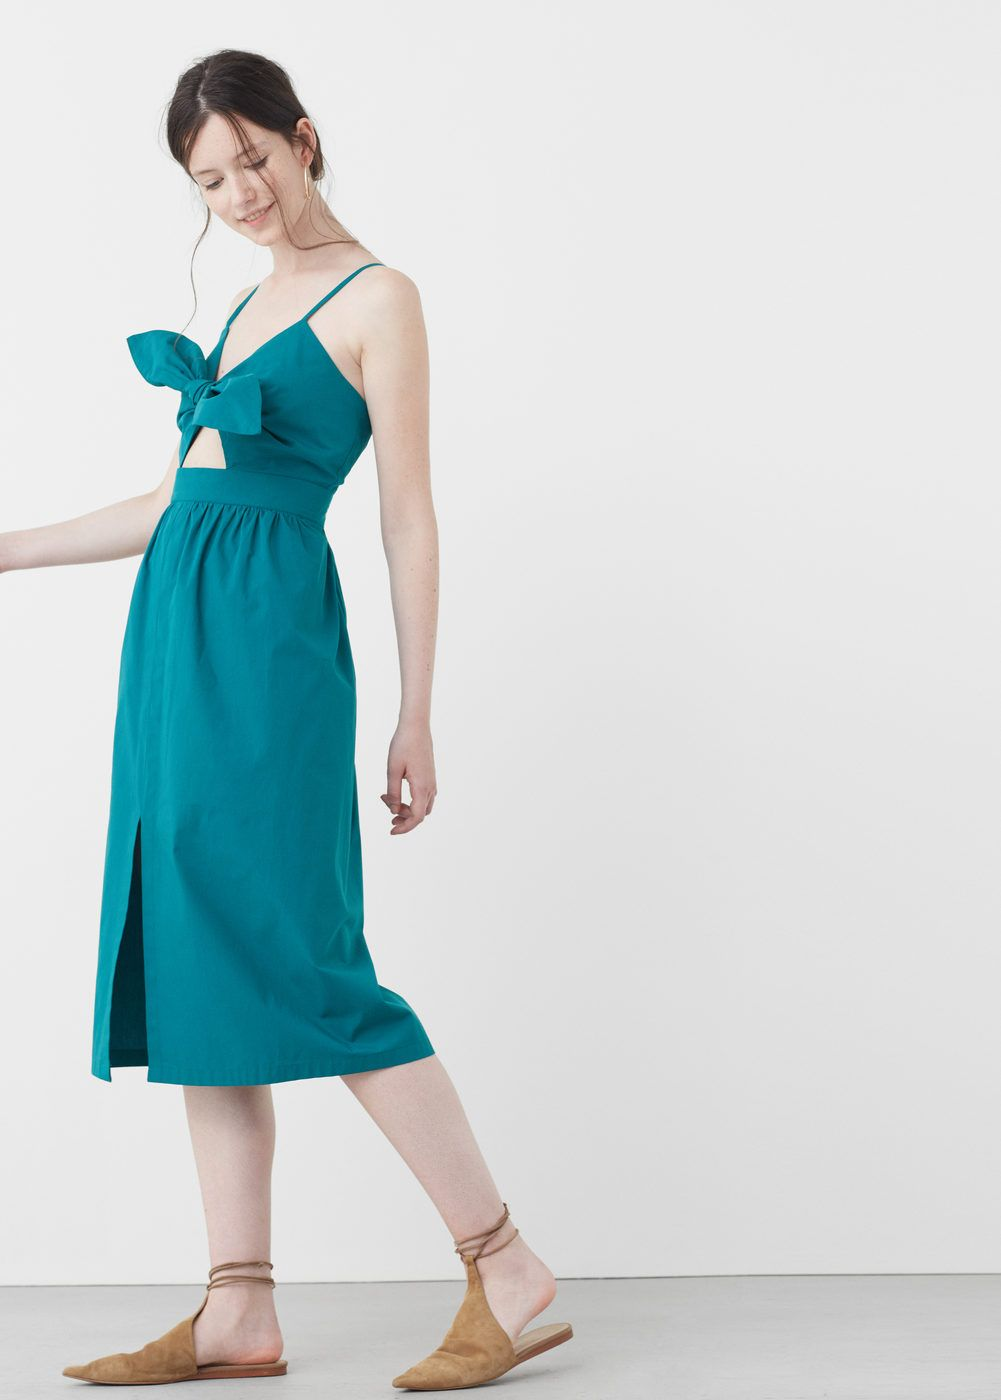 Popeline-kleid - Damen | Mango